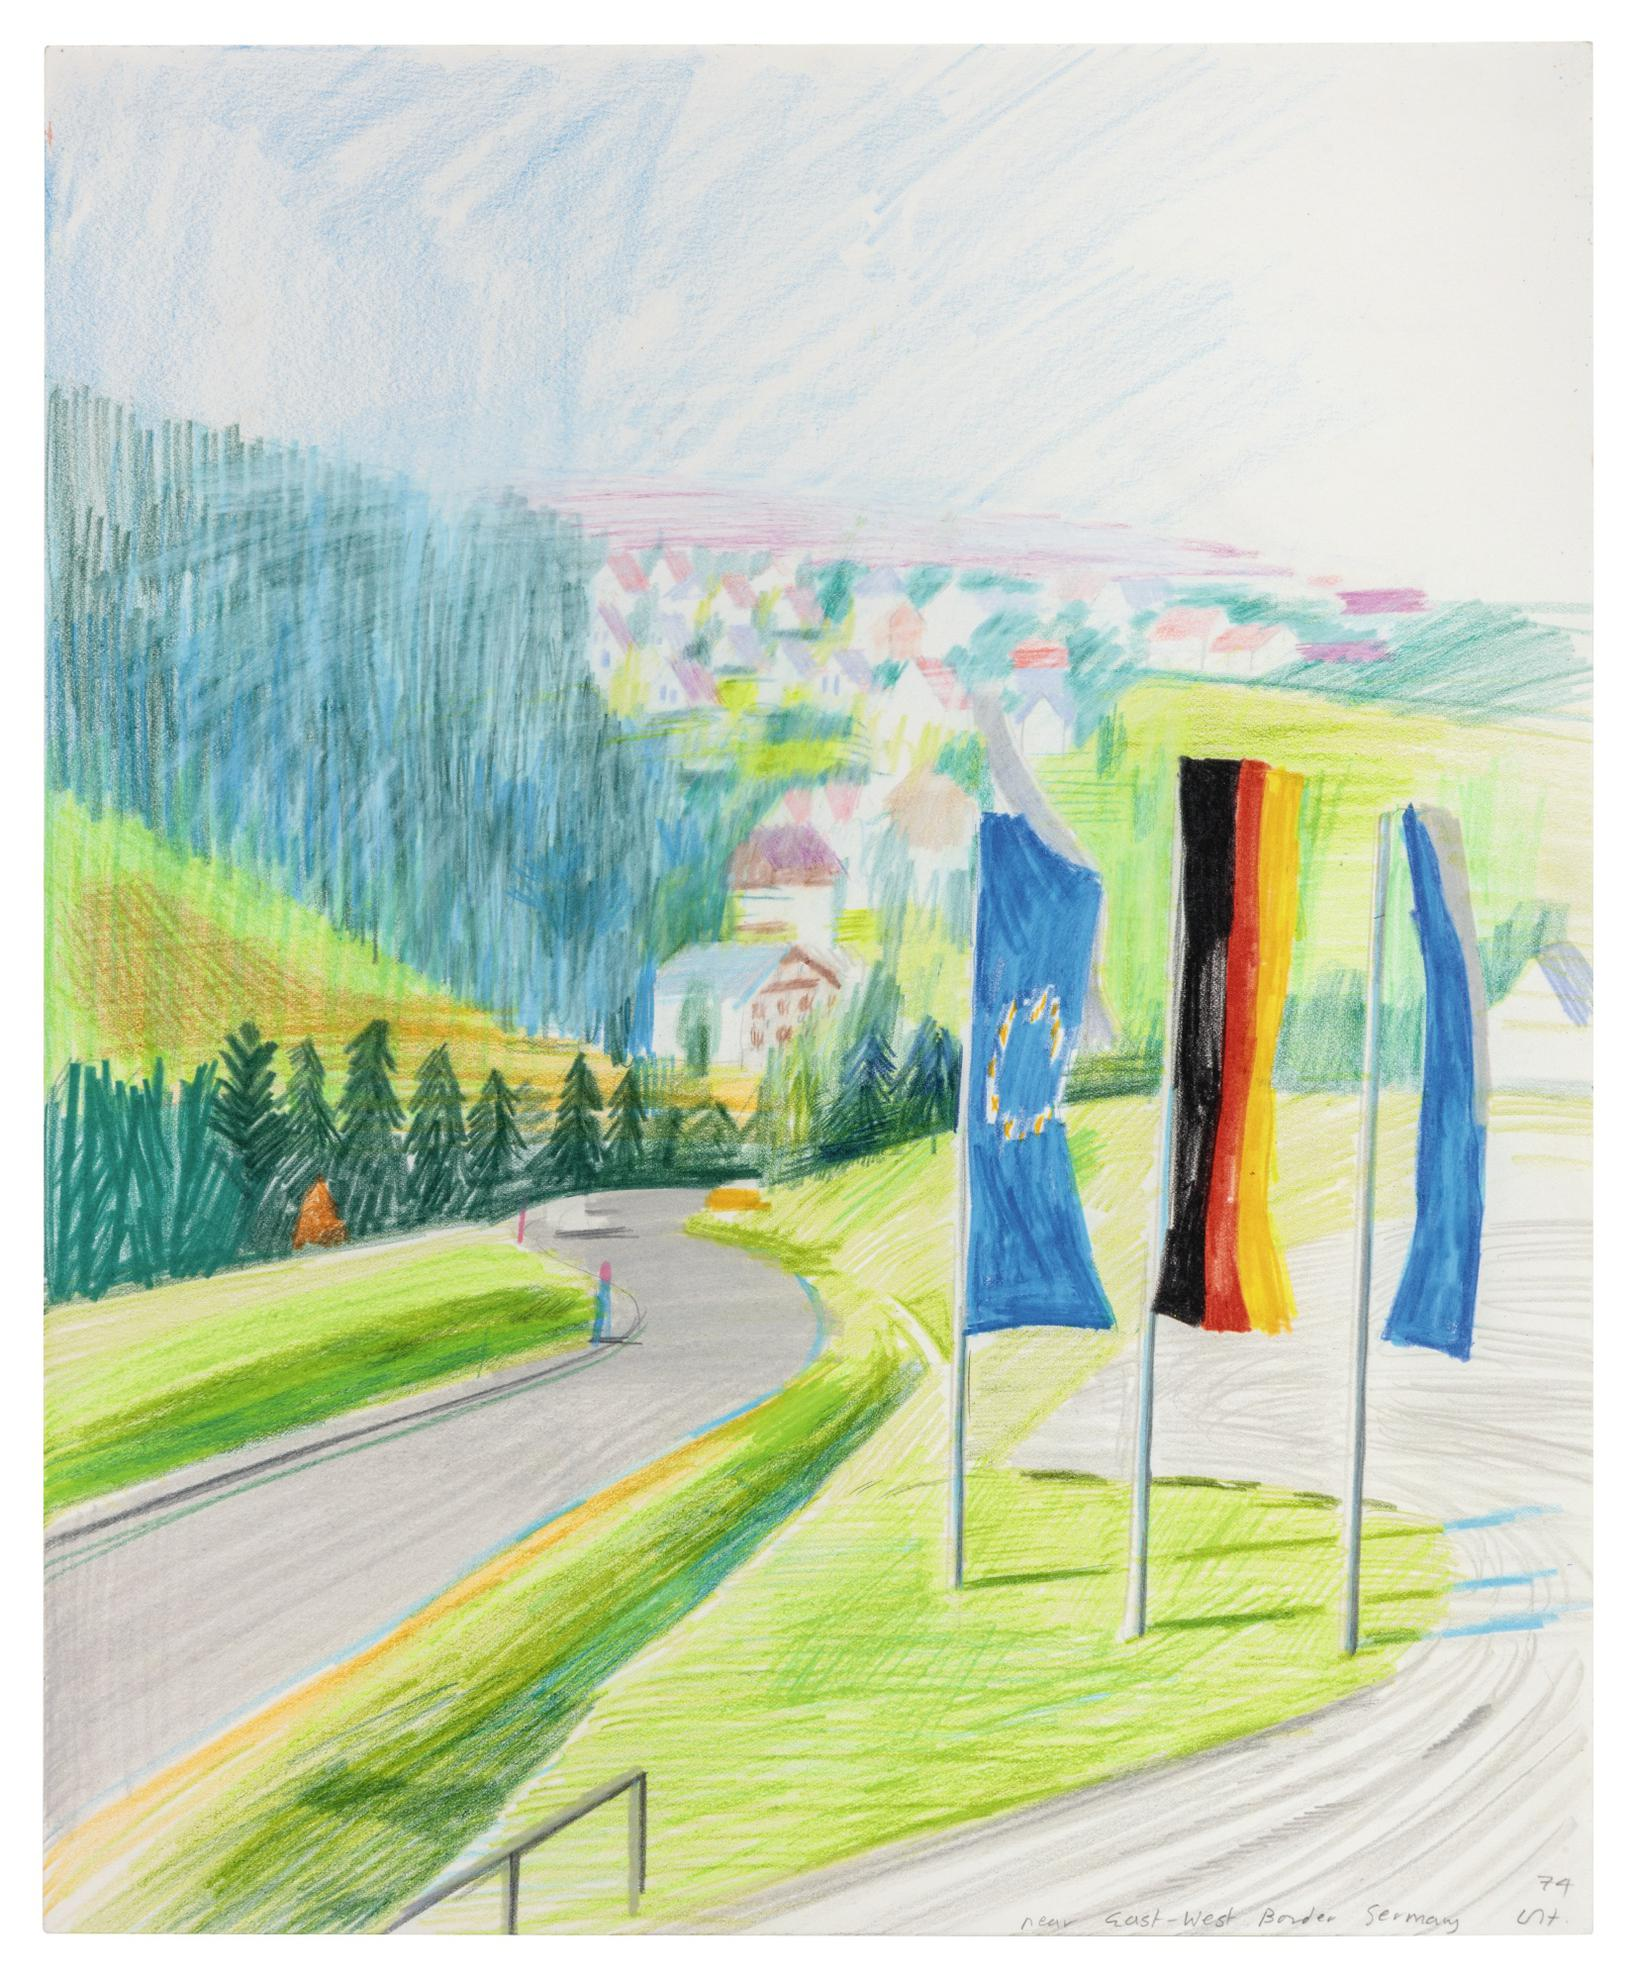 David Hockney-Near East West Border Germany-1974